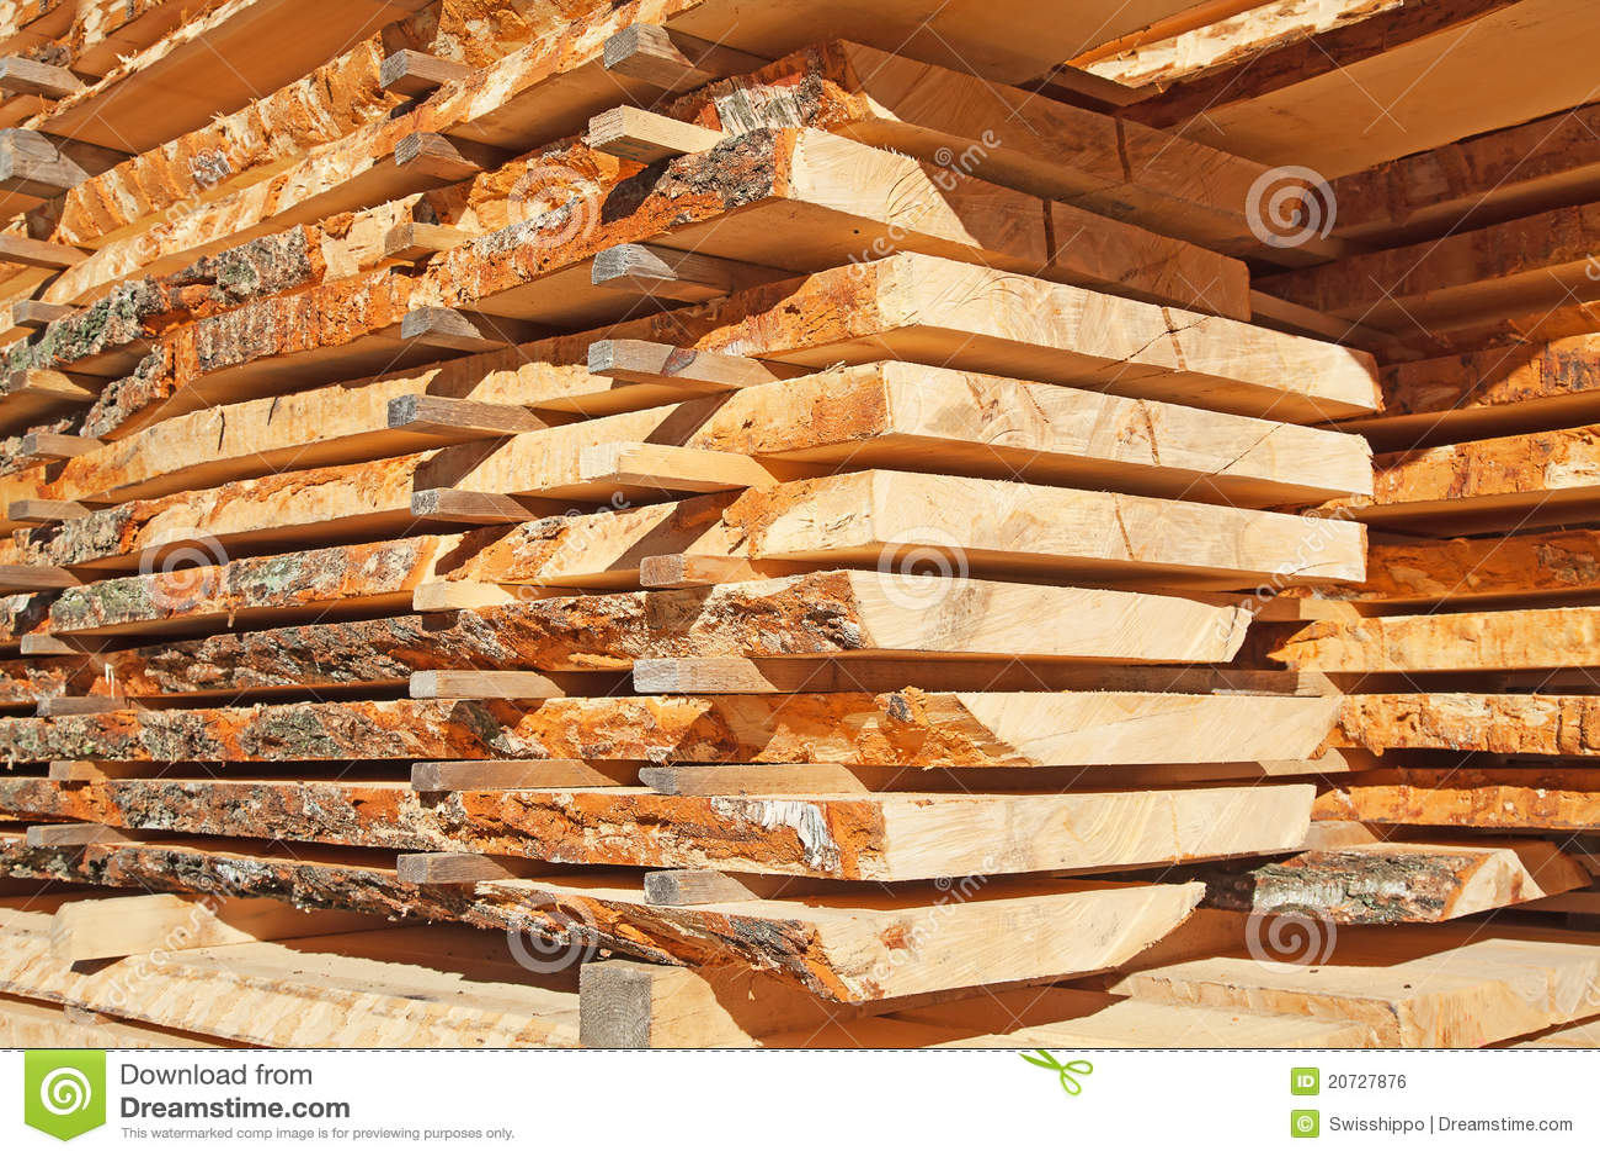 Postes de madera frescos imagen de archivo libre de - Postes de madera ...